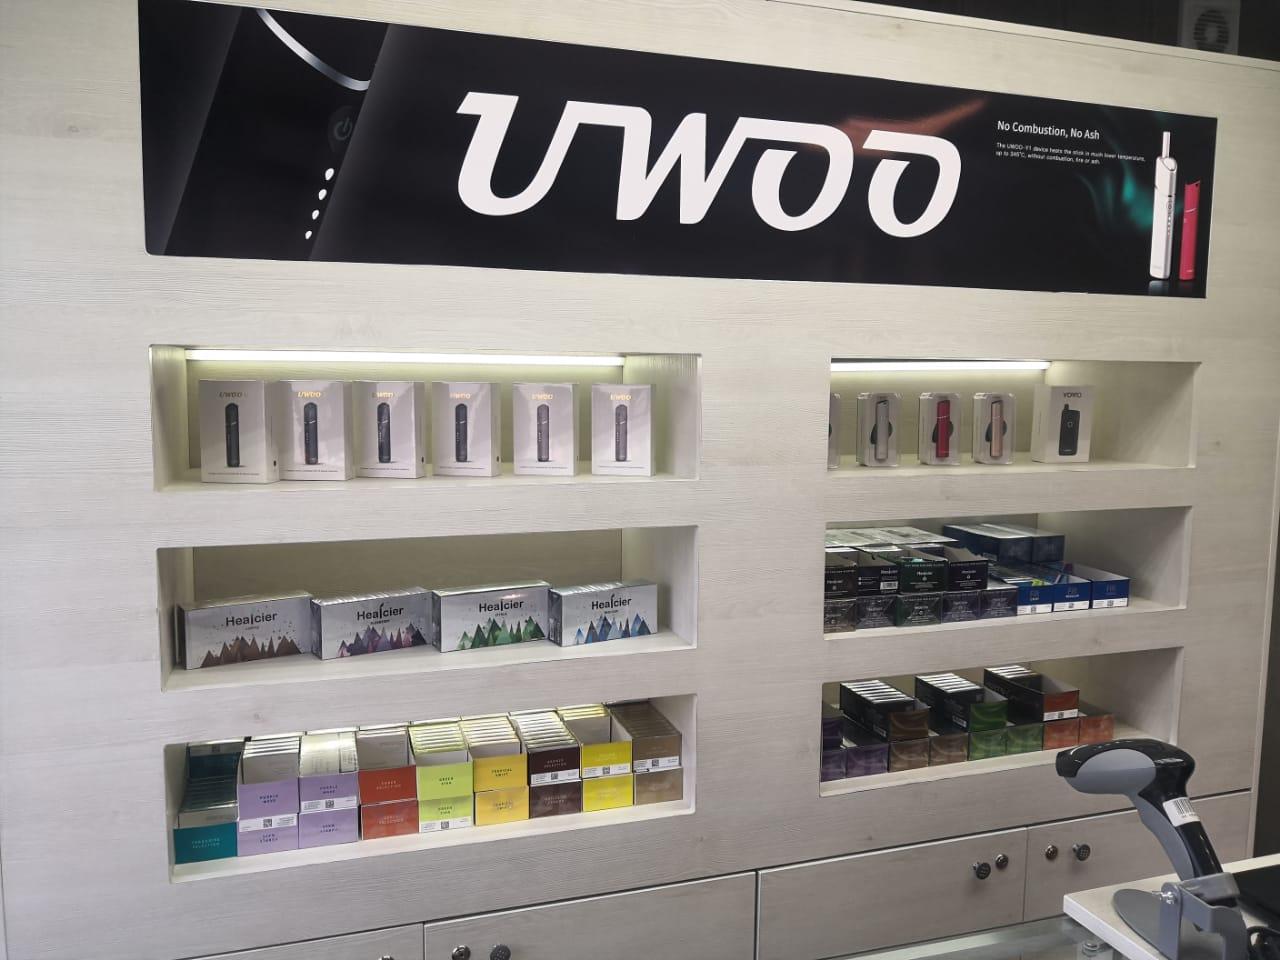 A corner of Uwoo® heat-not-burn shop